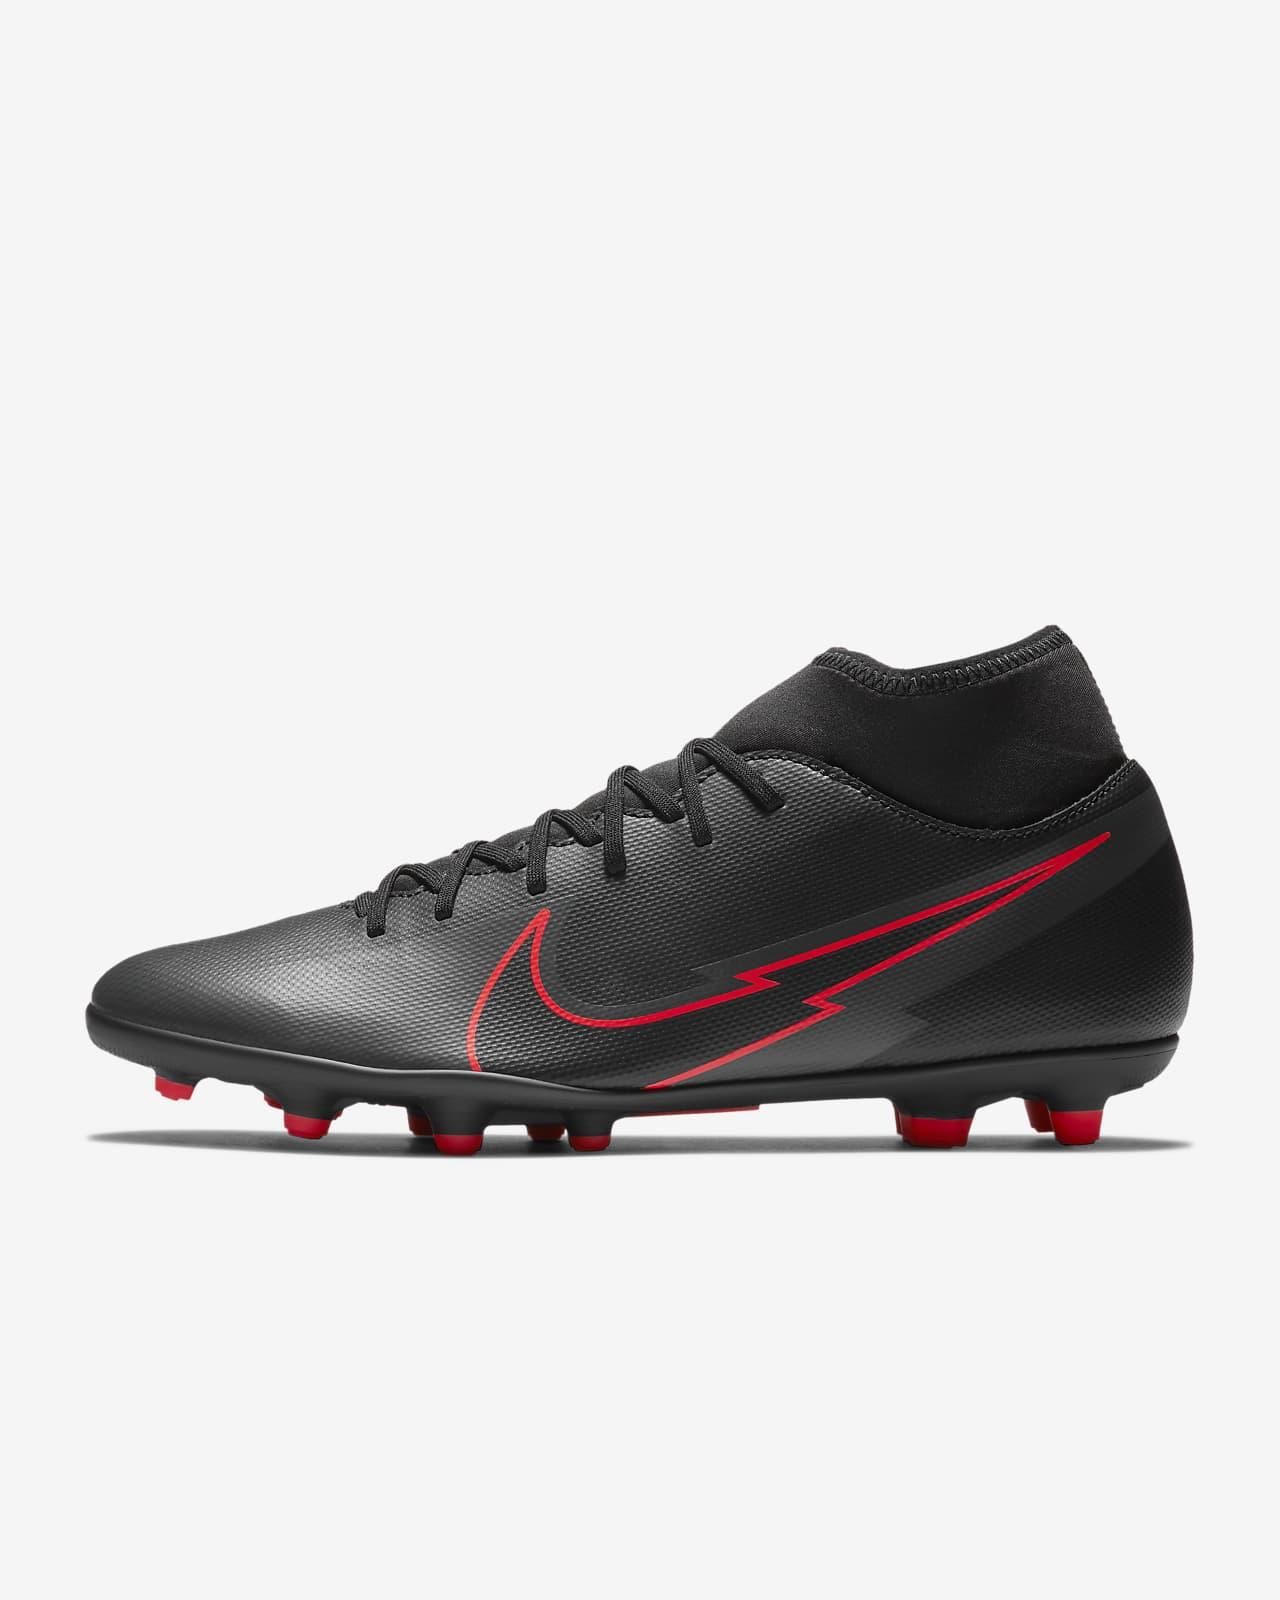 Chuteiras de futebol multiterreno Nike Mercurial Superfly 7 Club MG